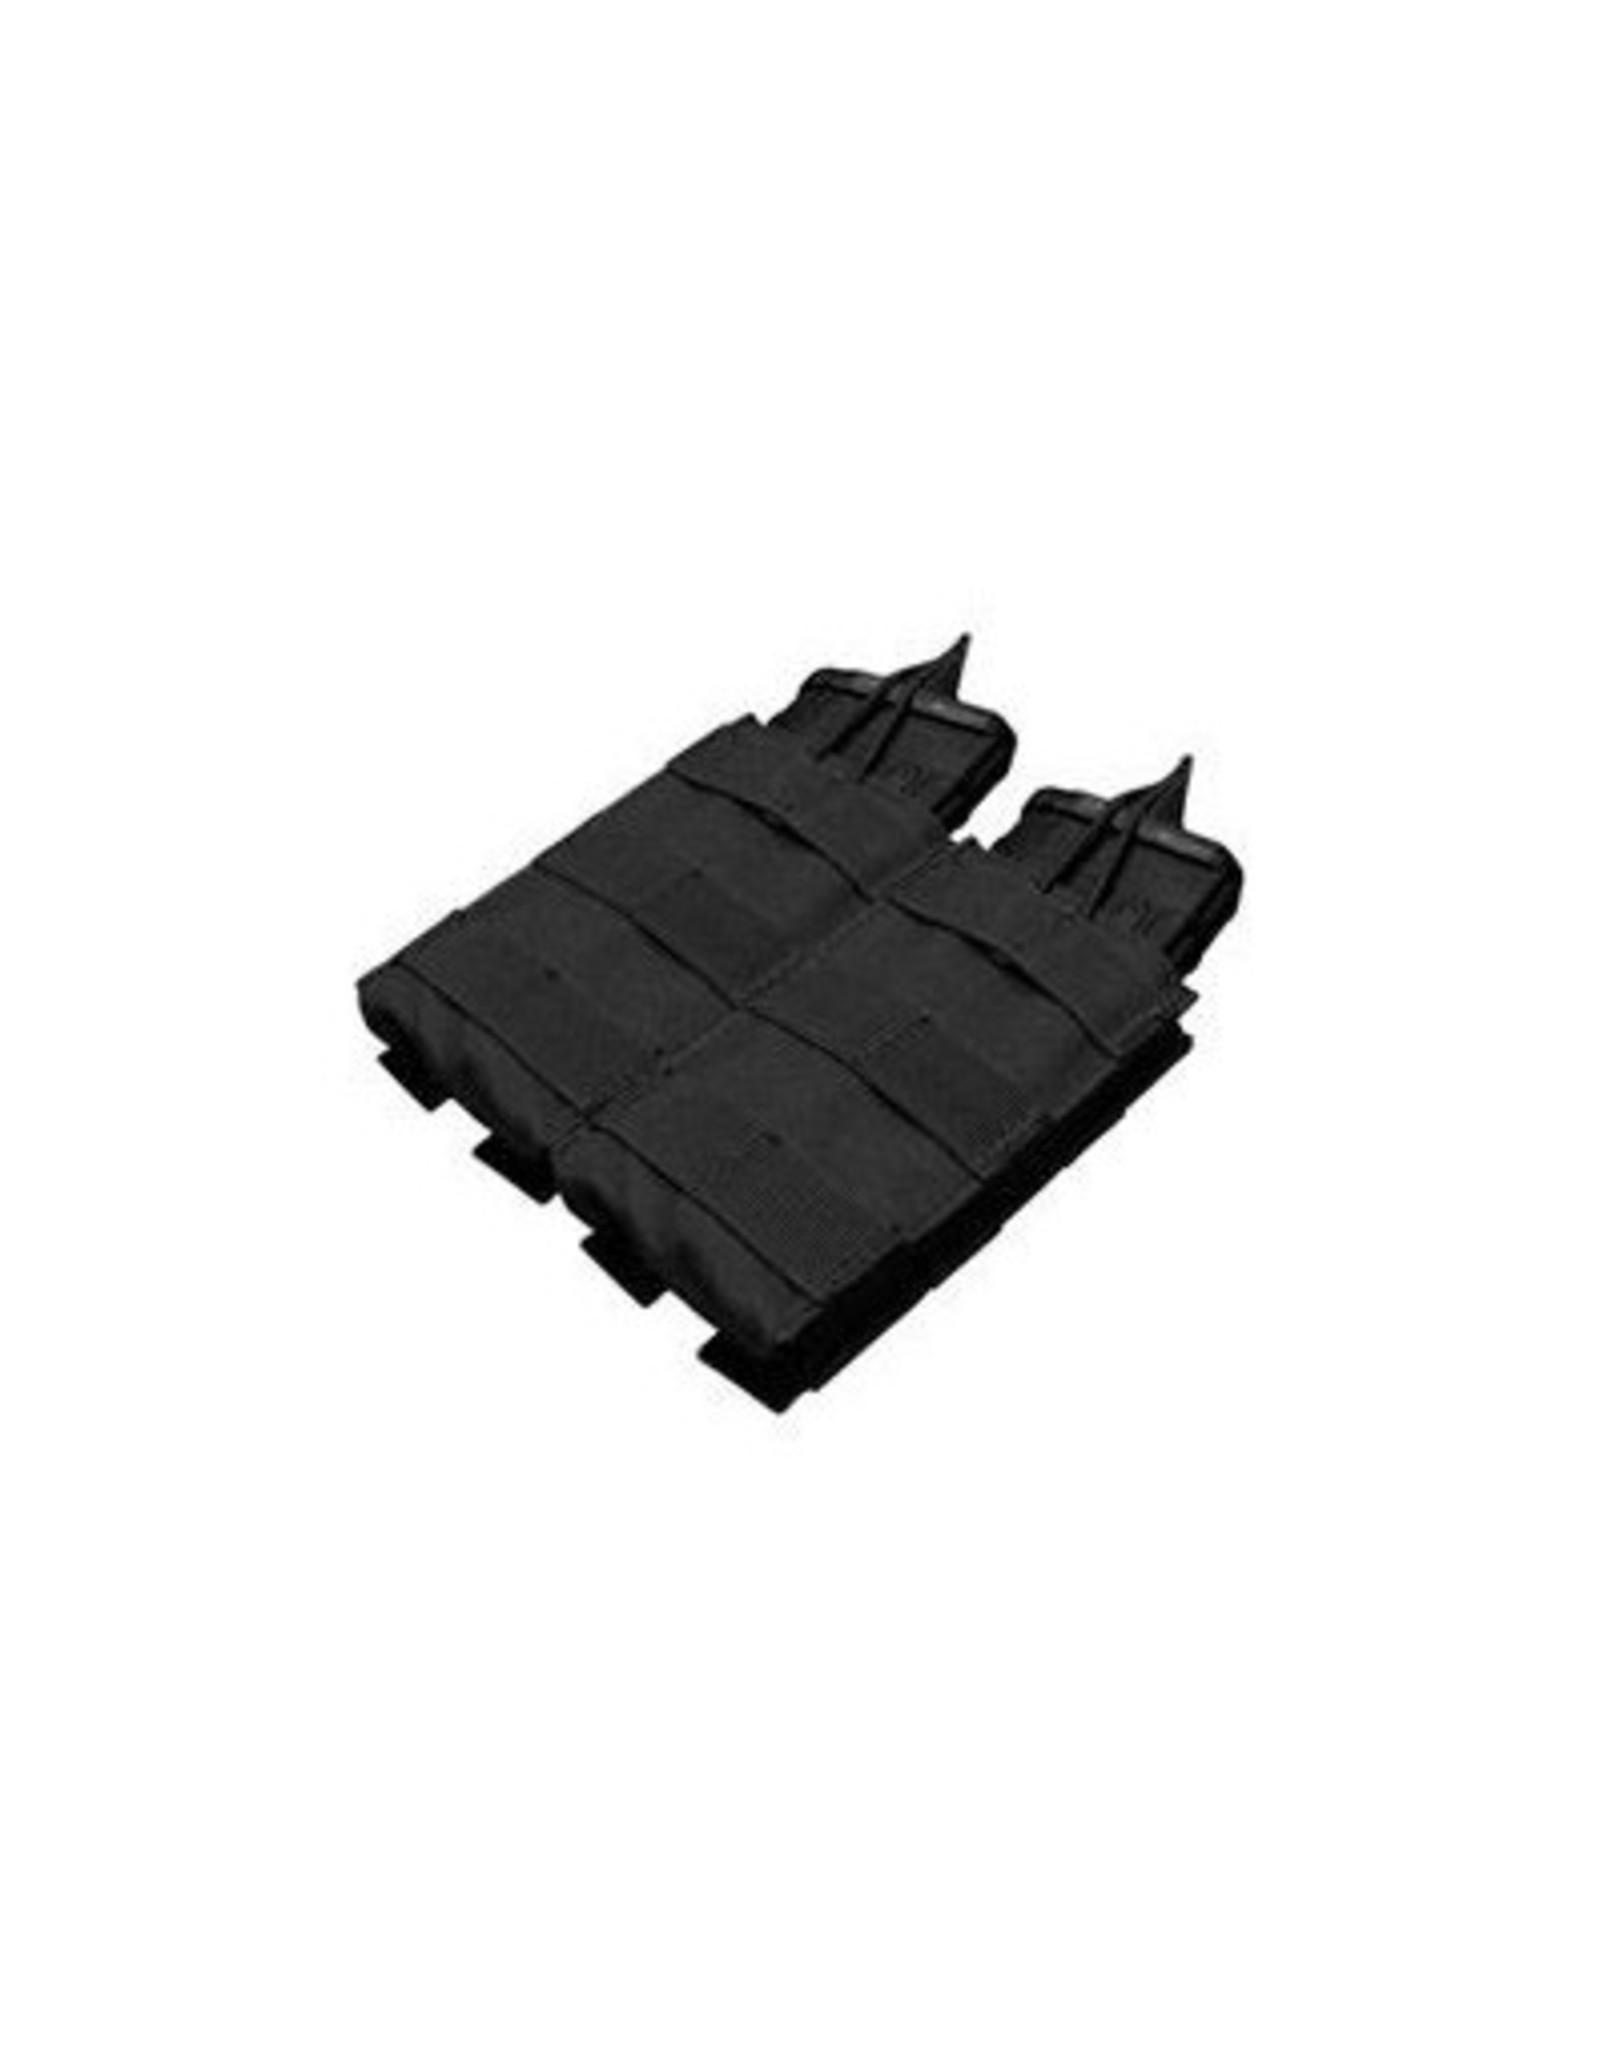 CONDOR TACTICAL TRIPLE M4/M16 MAG POUCH